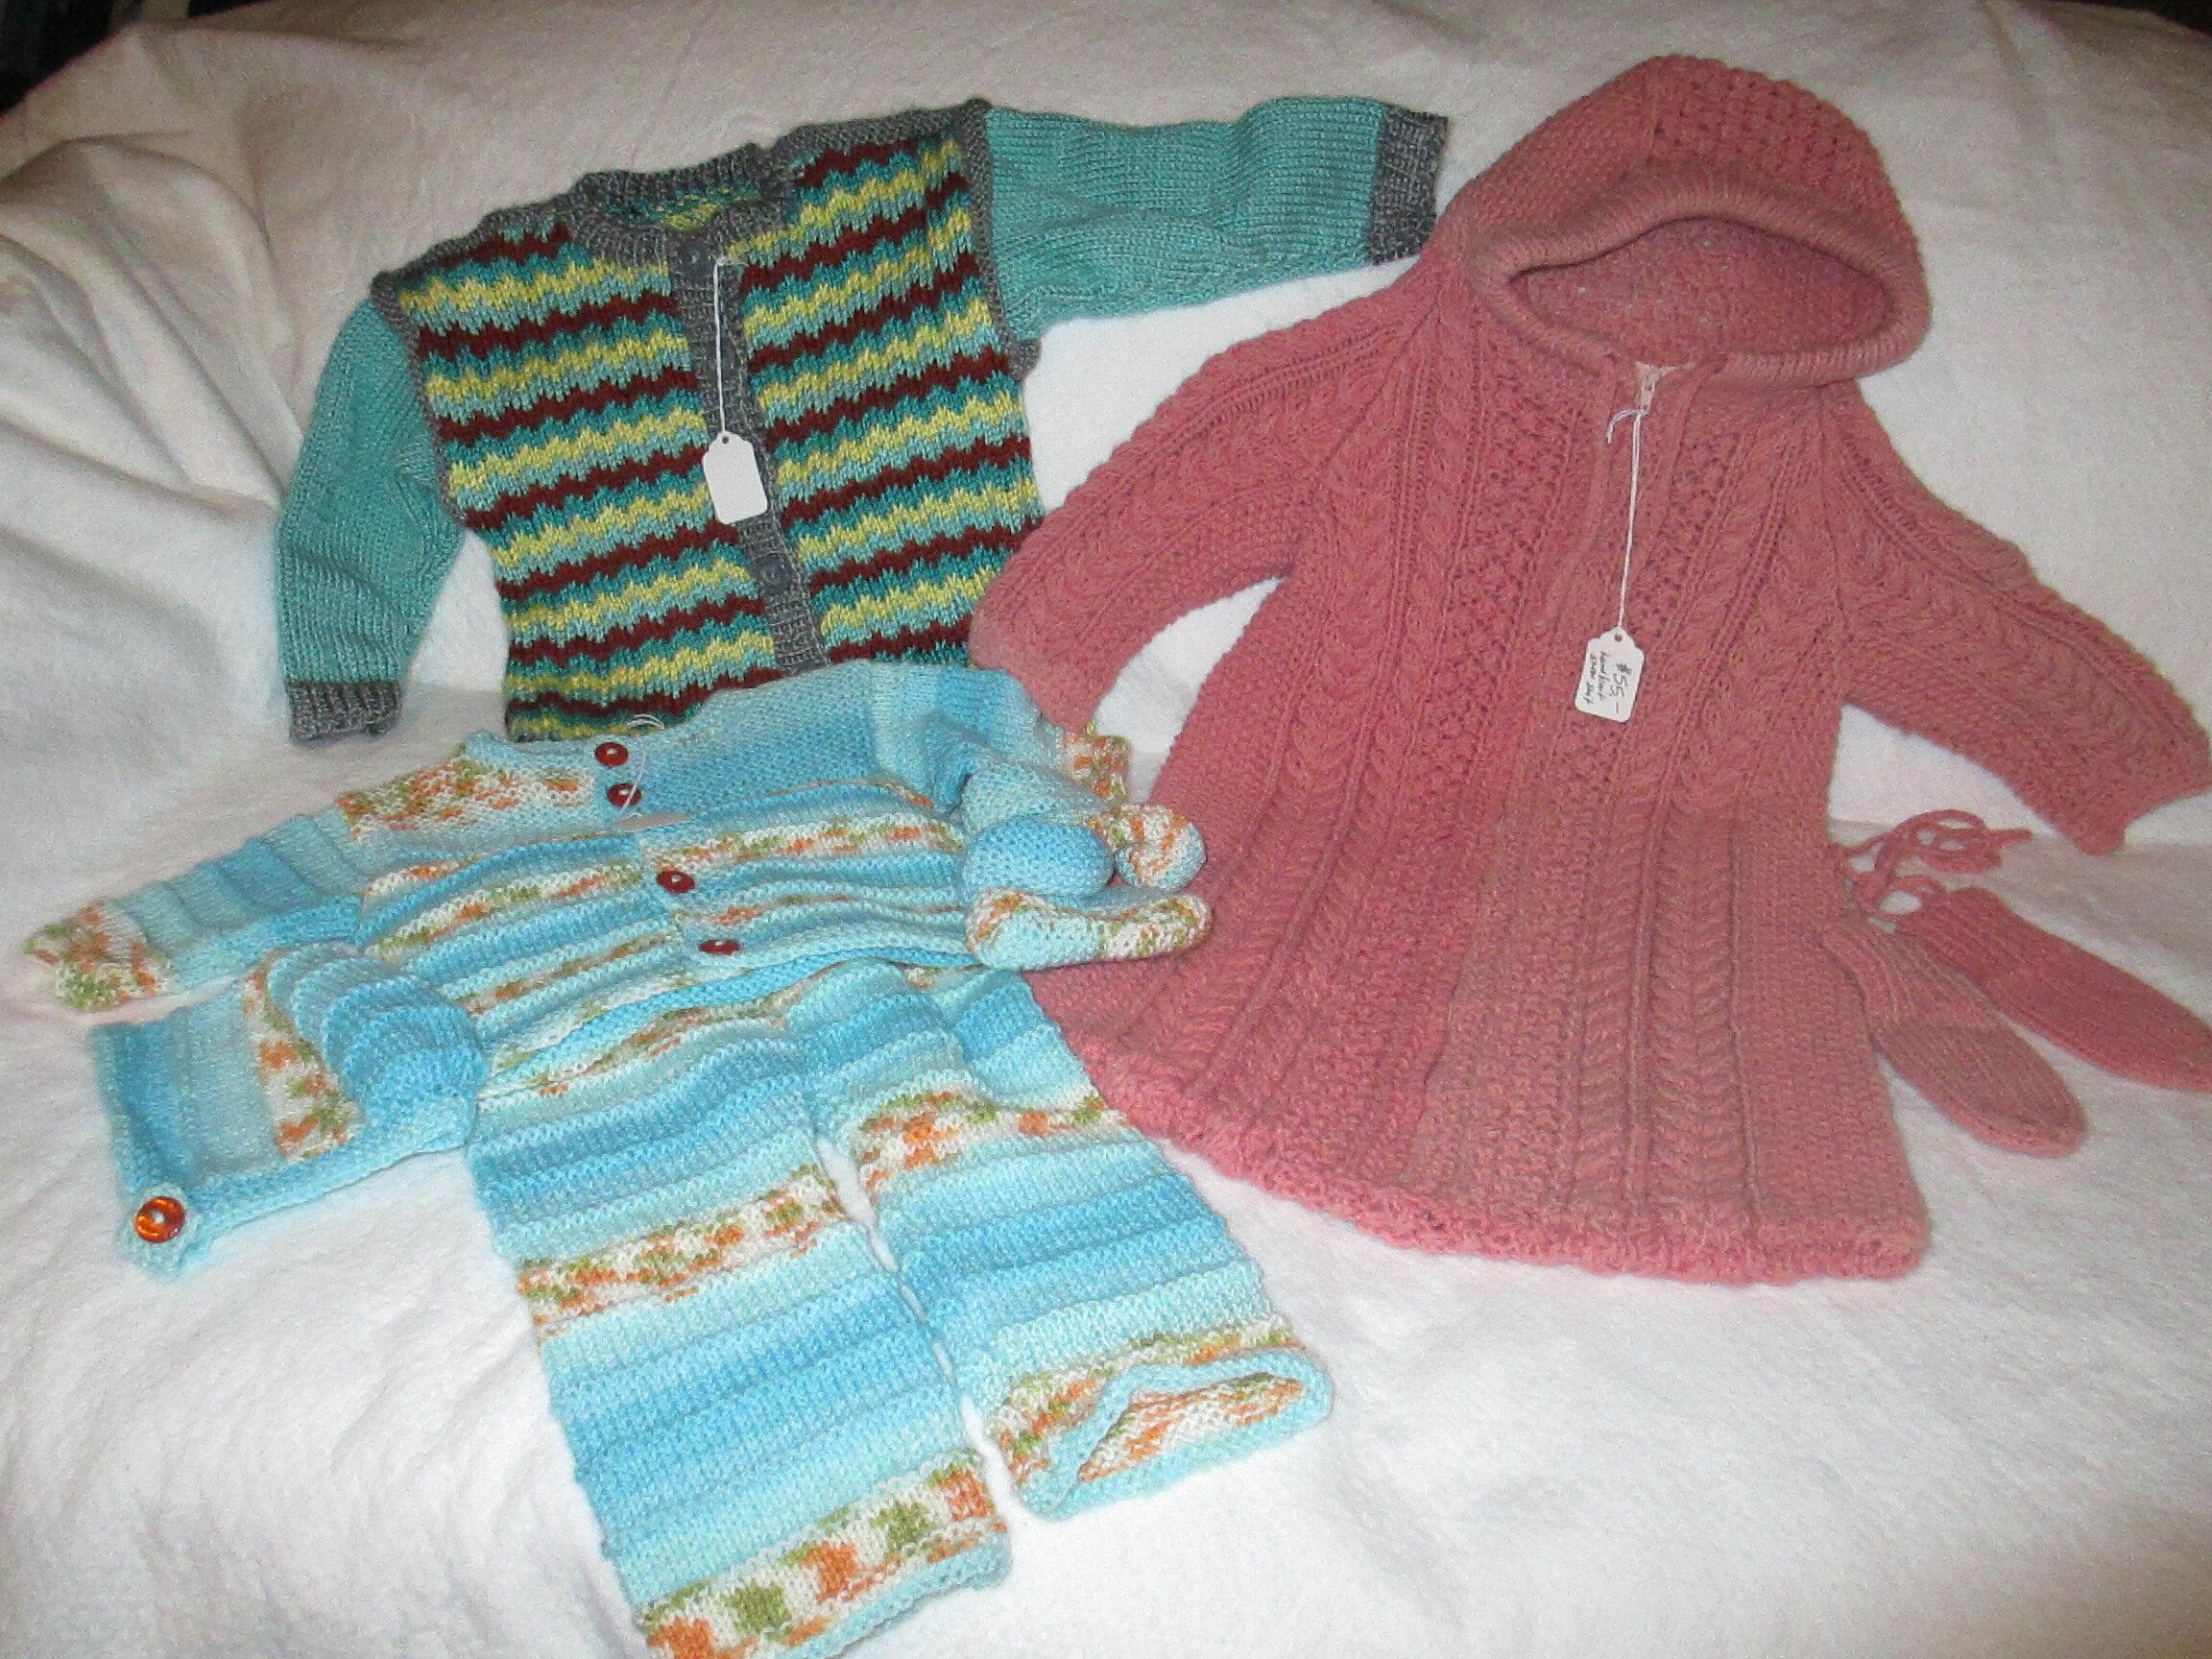 bstenzel_baby_clothes.JPG